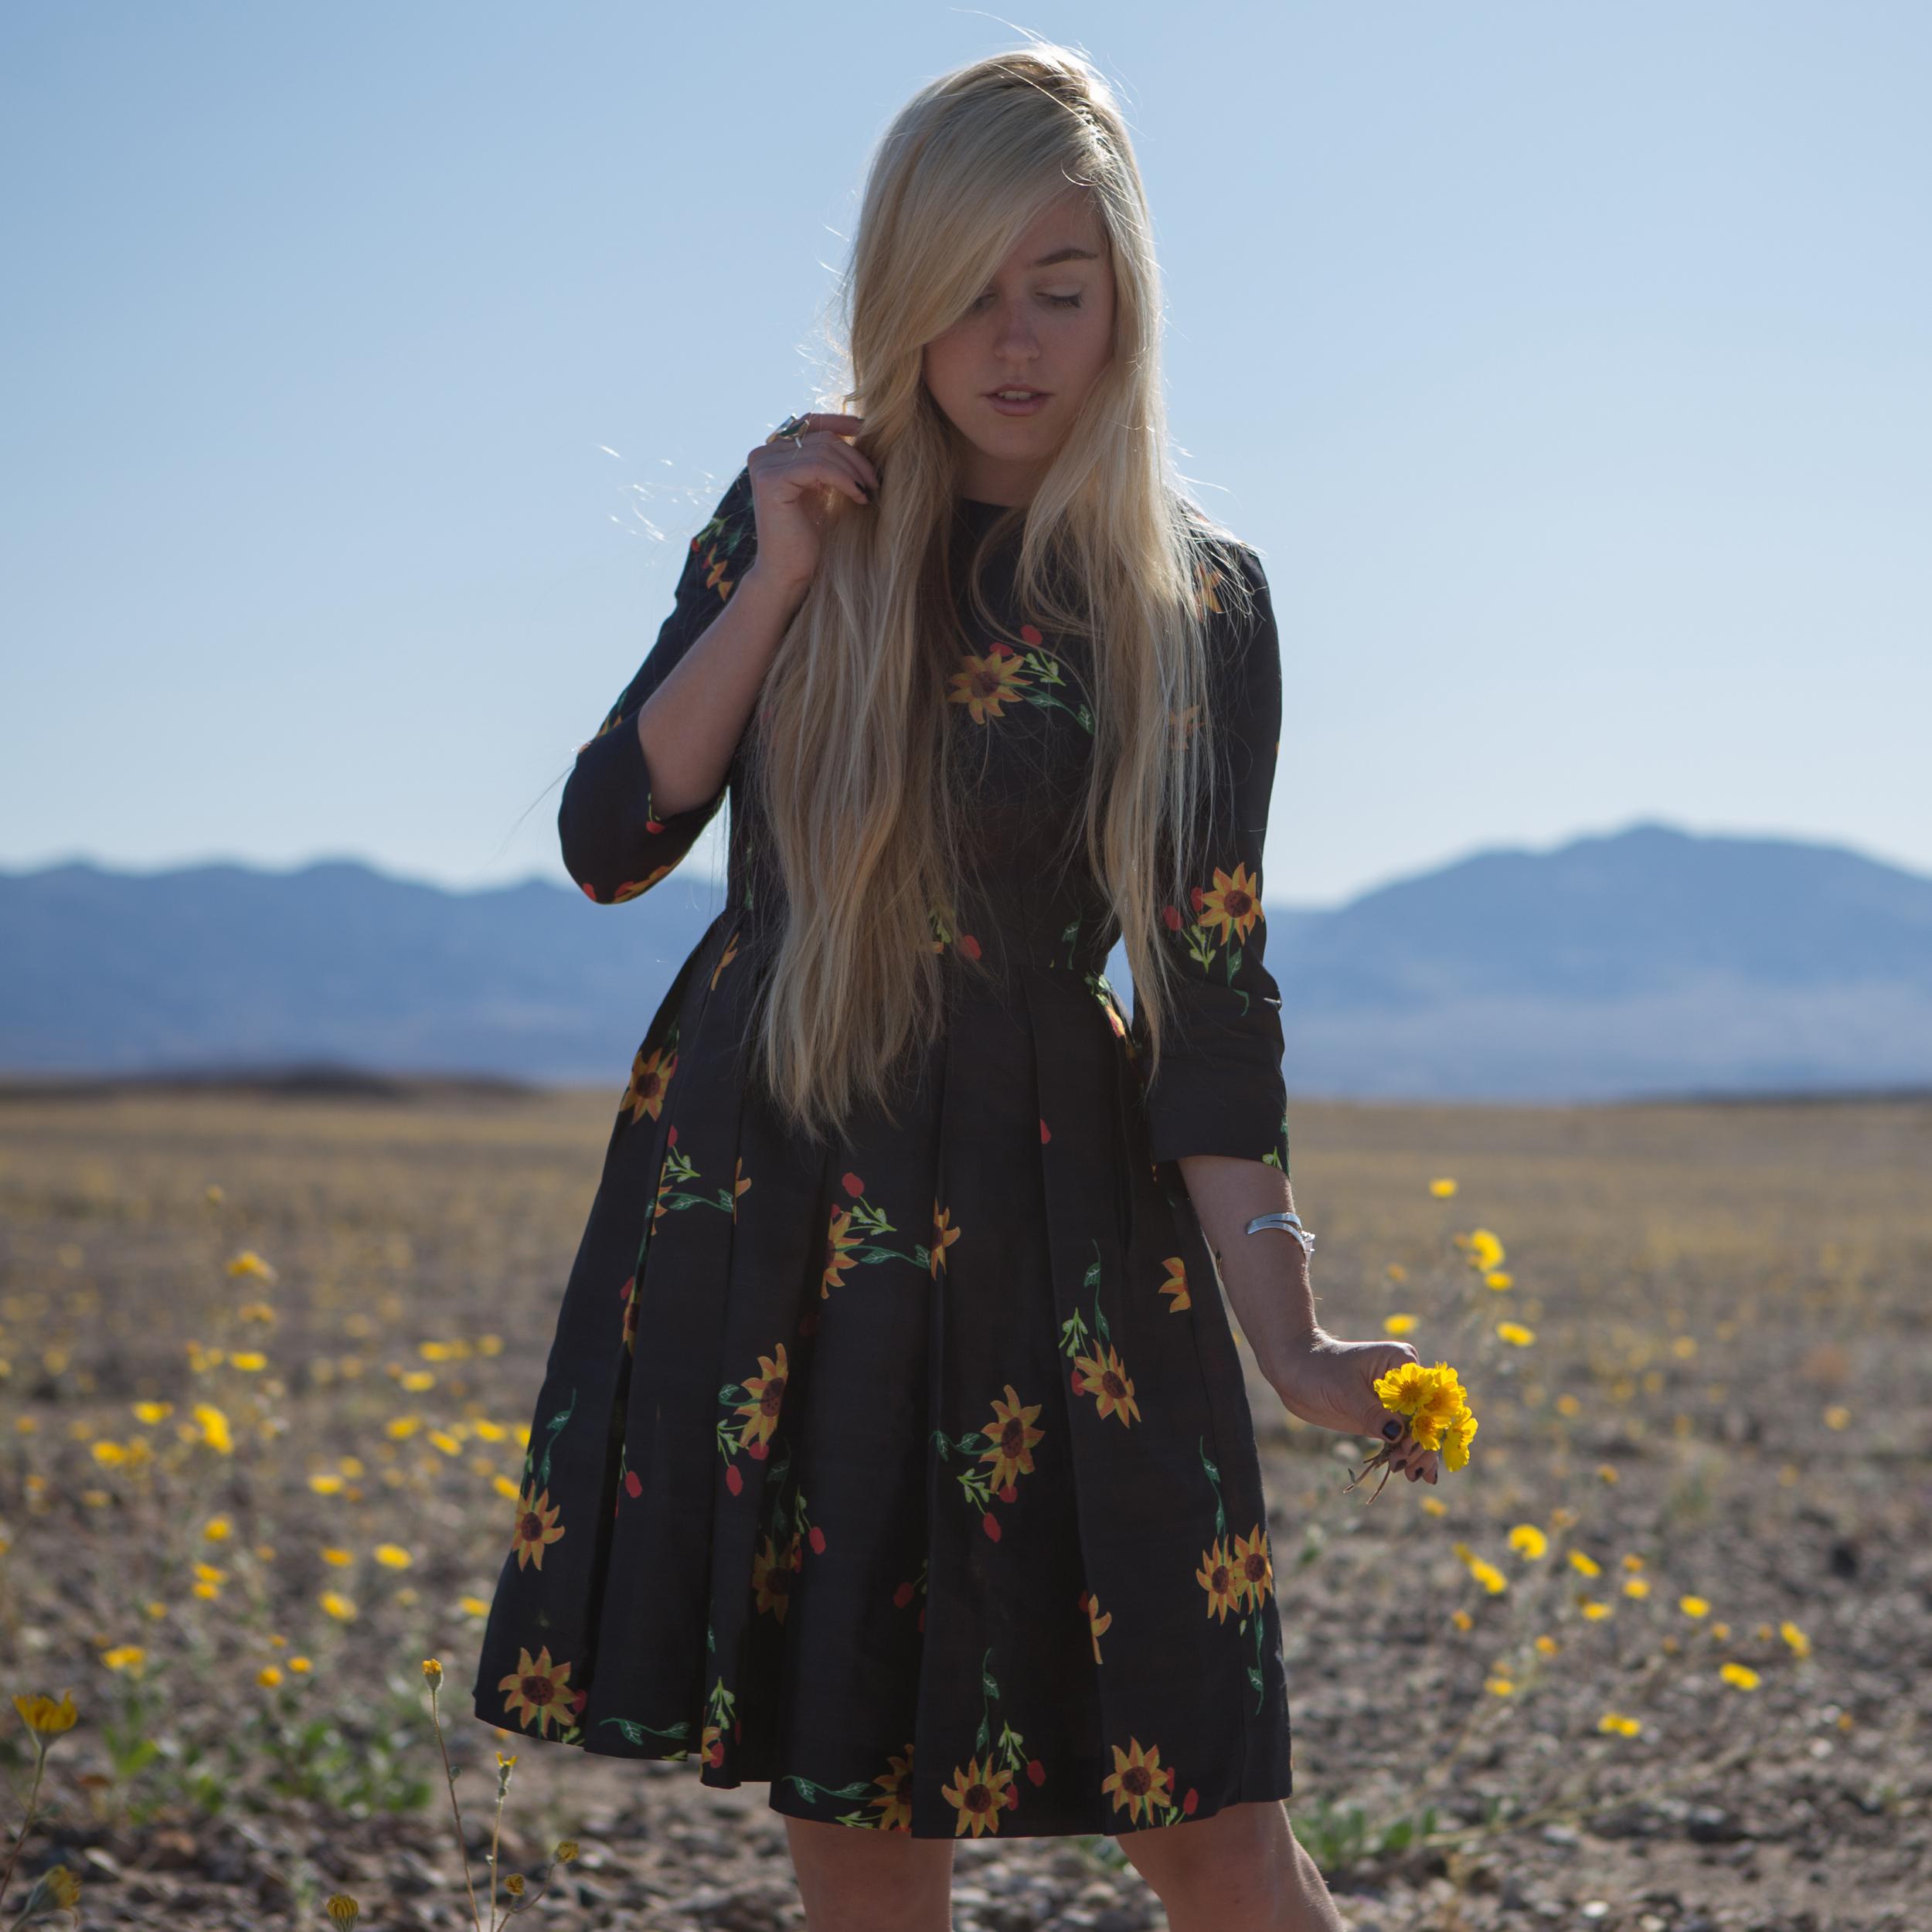 fewmodaflowerdress.jpg